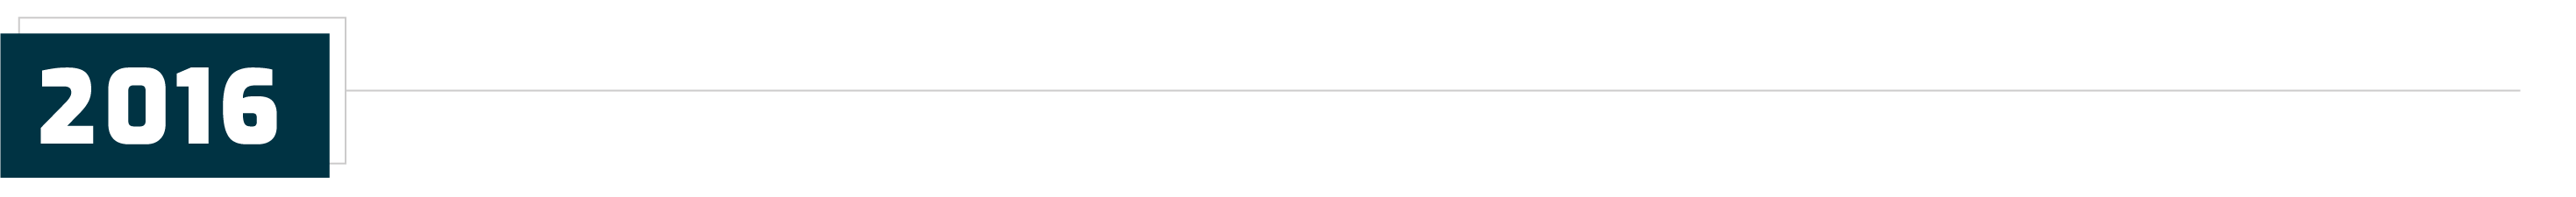 Choice Bank Timeline 2016